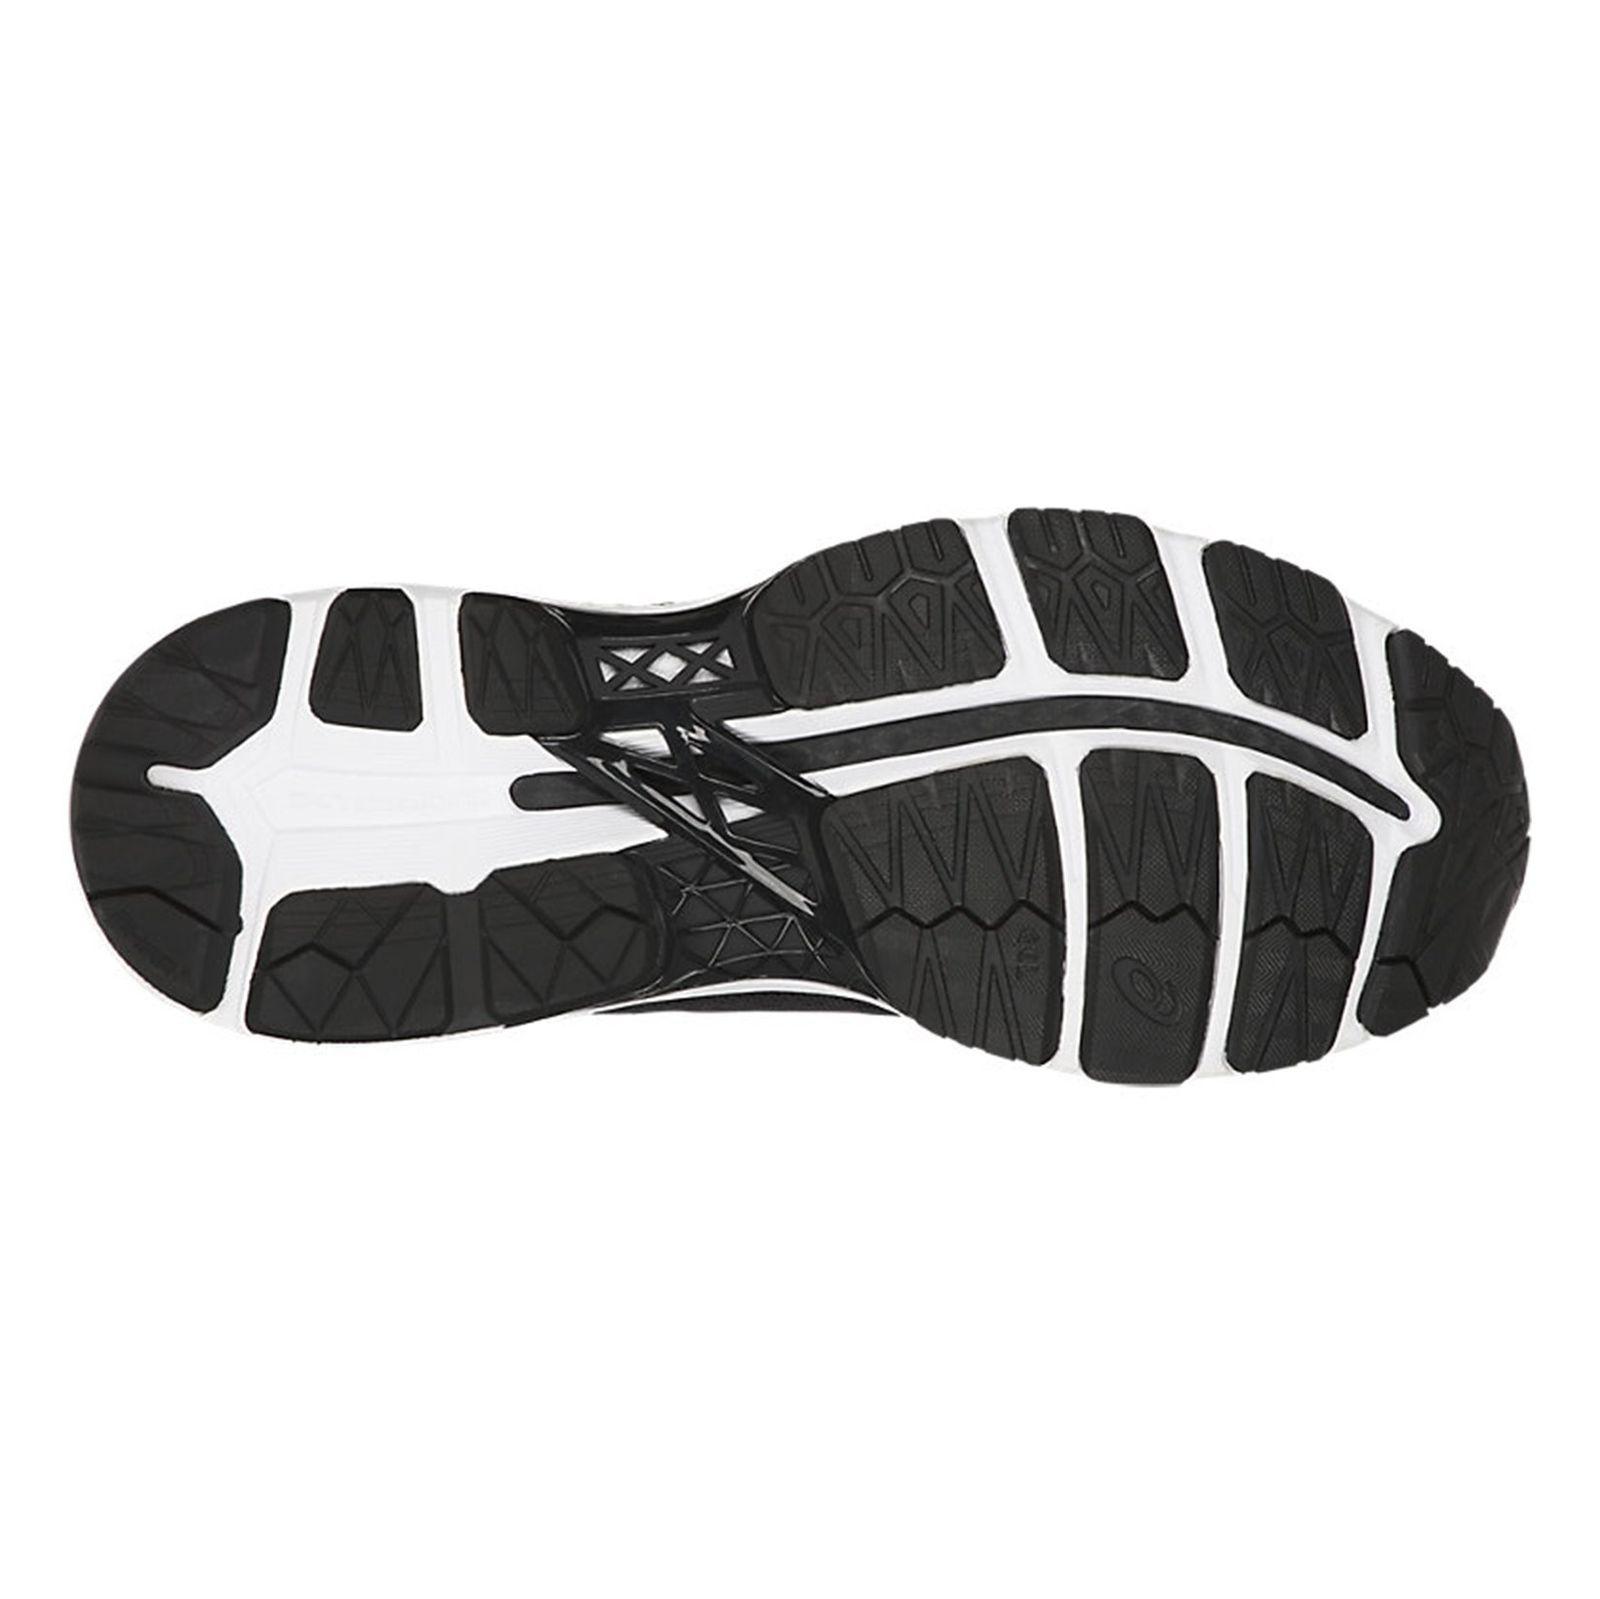 کفش دویدن بندی زنانه GEL-KAYANO 24 - اسیکس - مشکي - 3